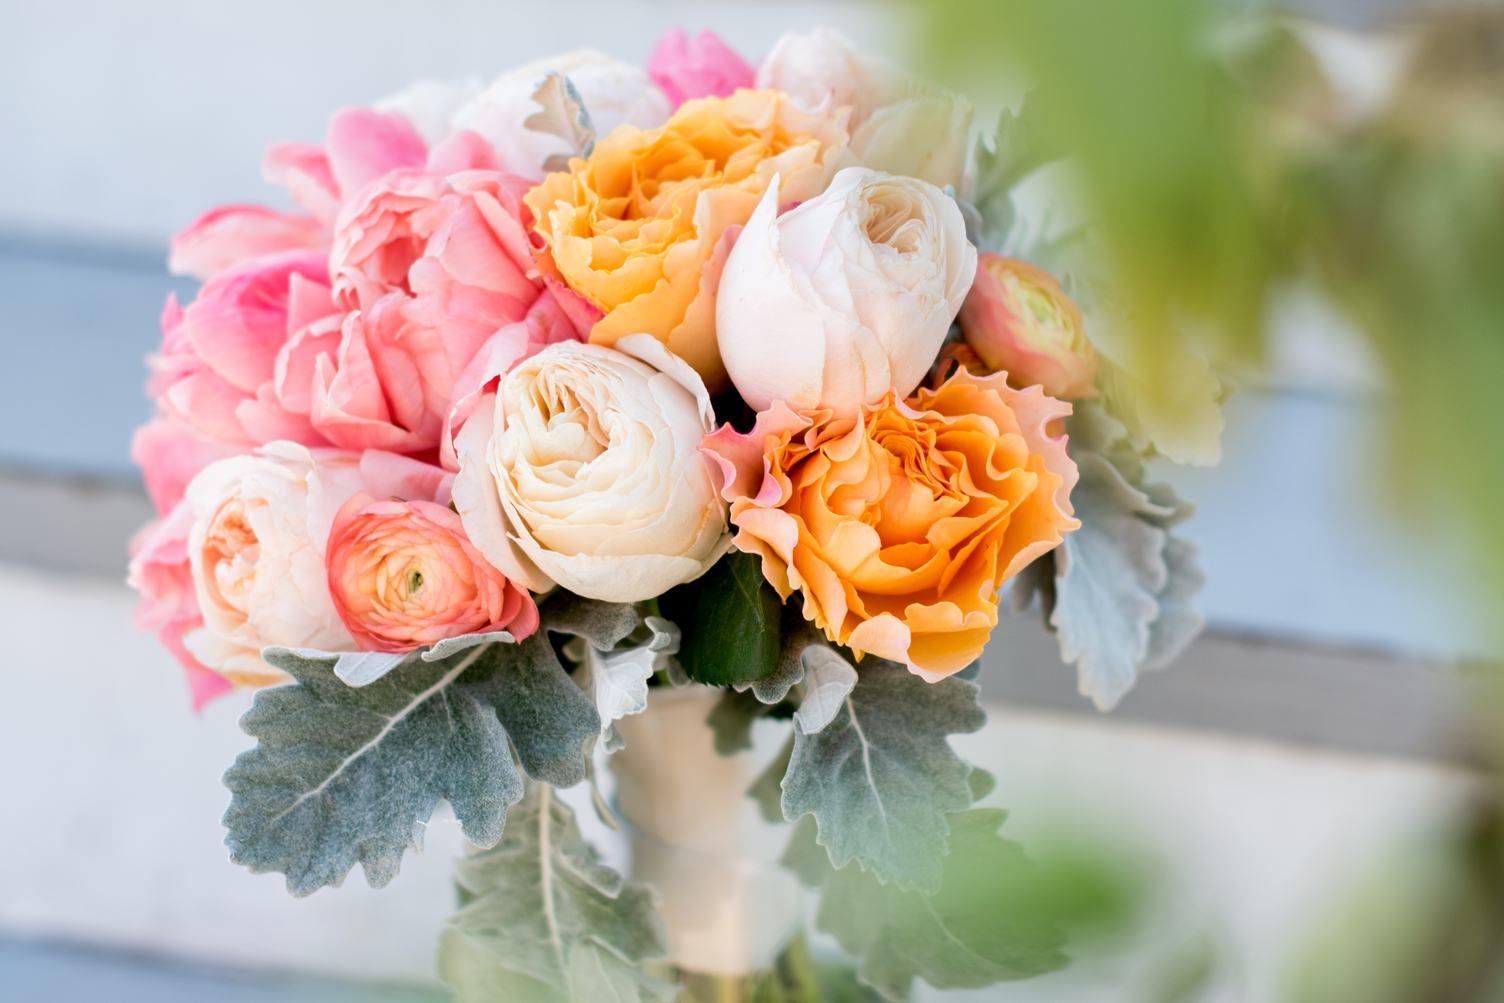 Beautiful Fresh Pink and Orange Roses